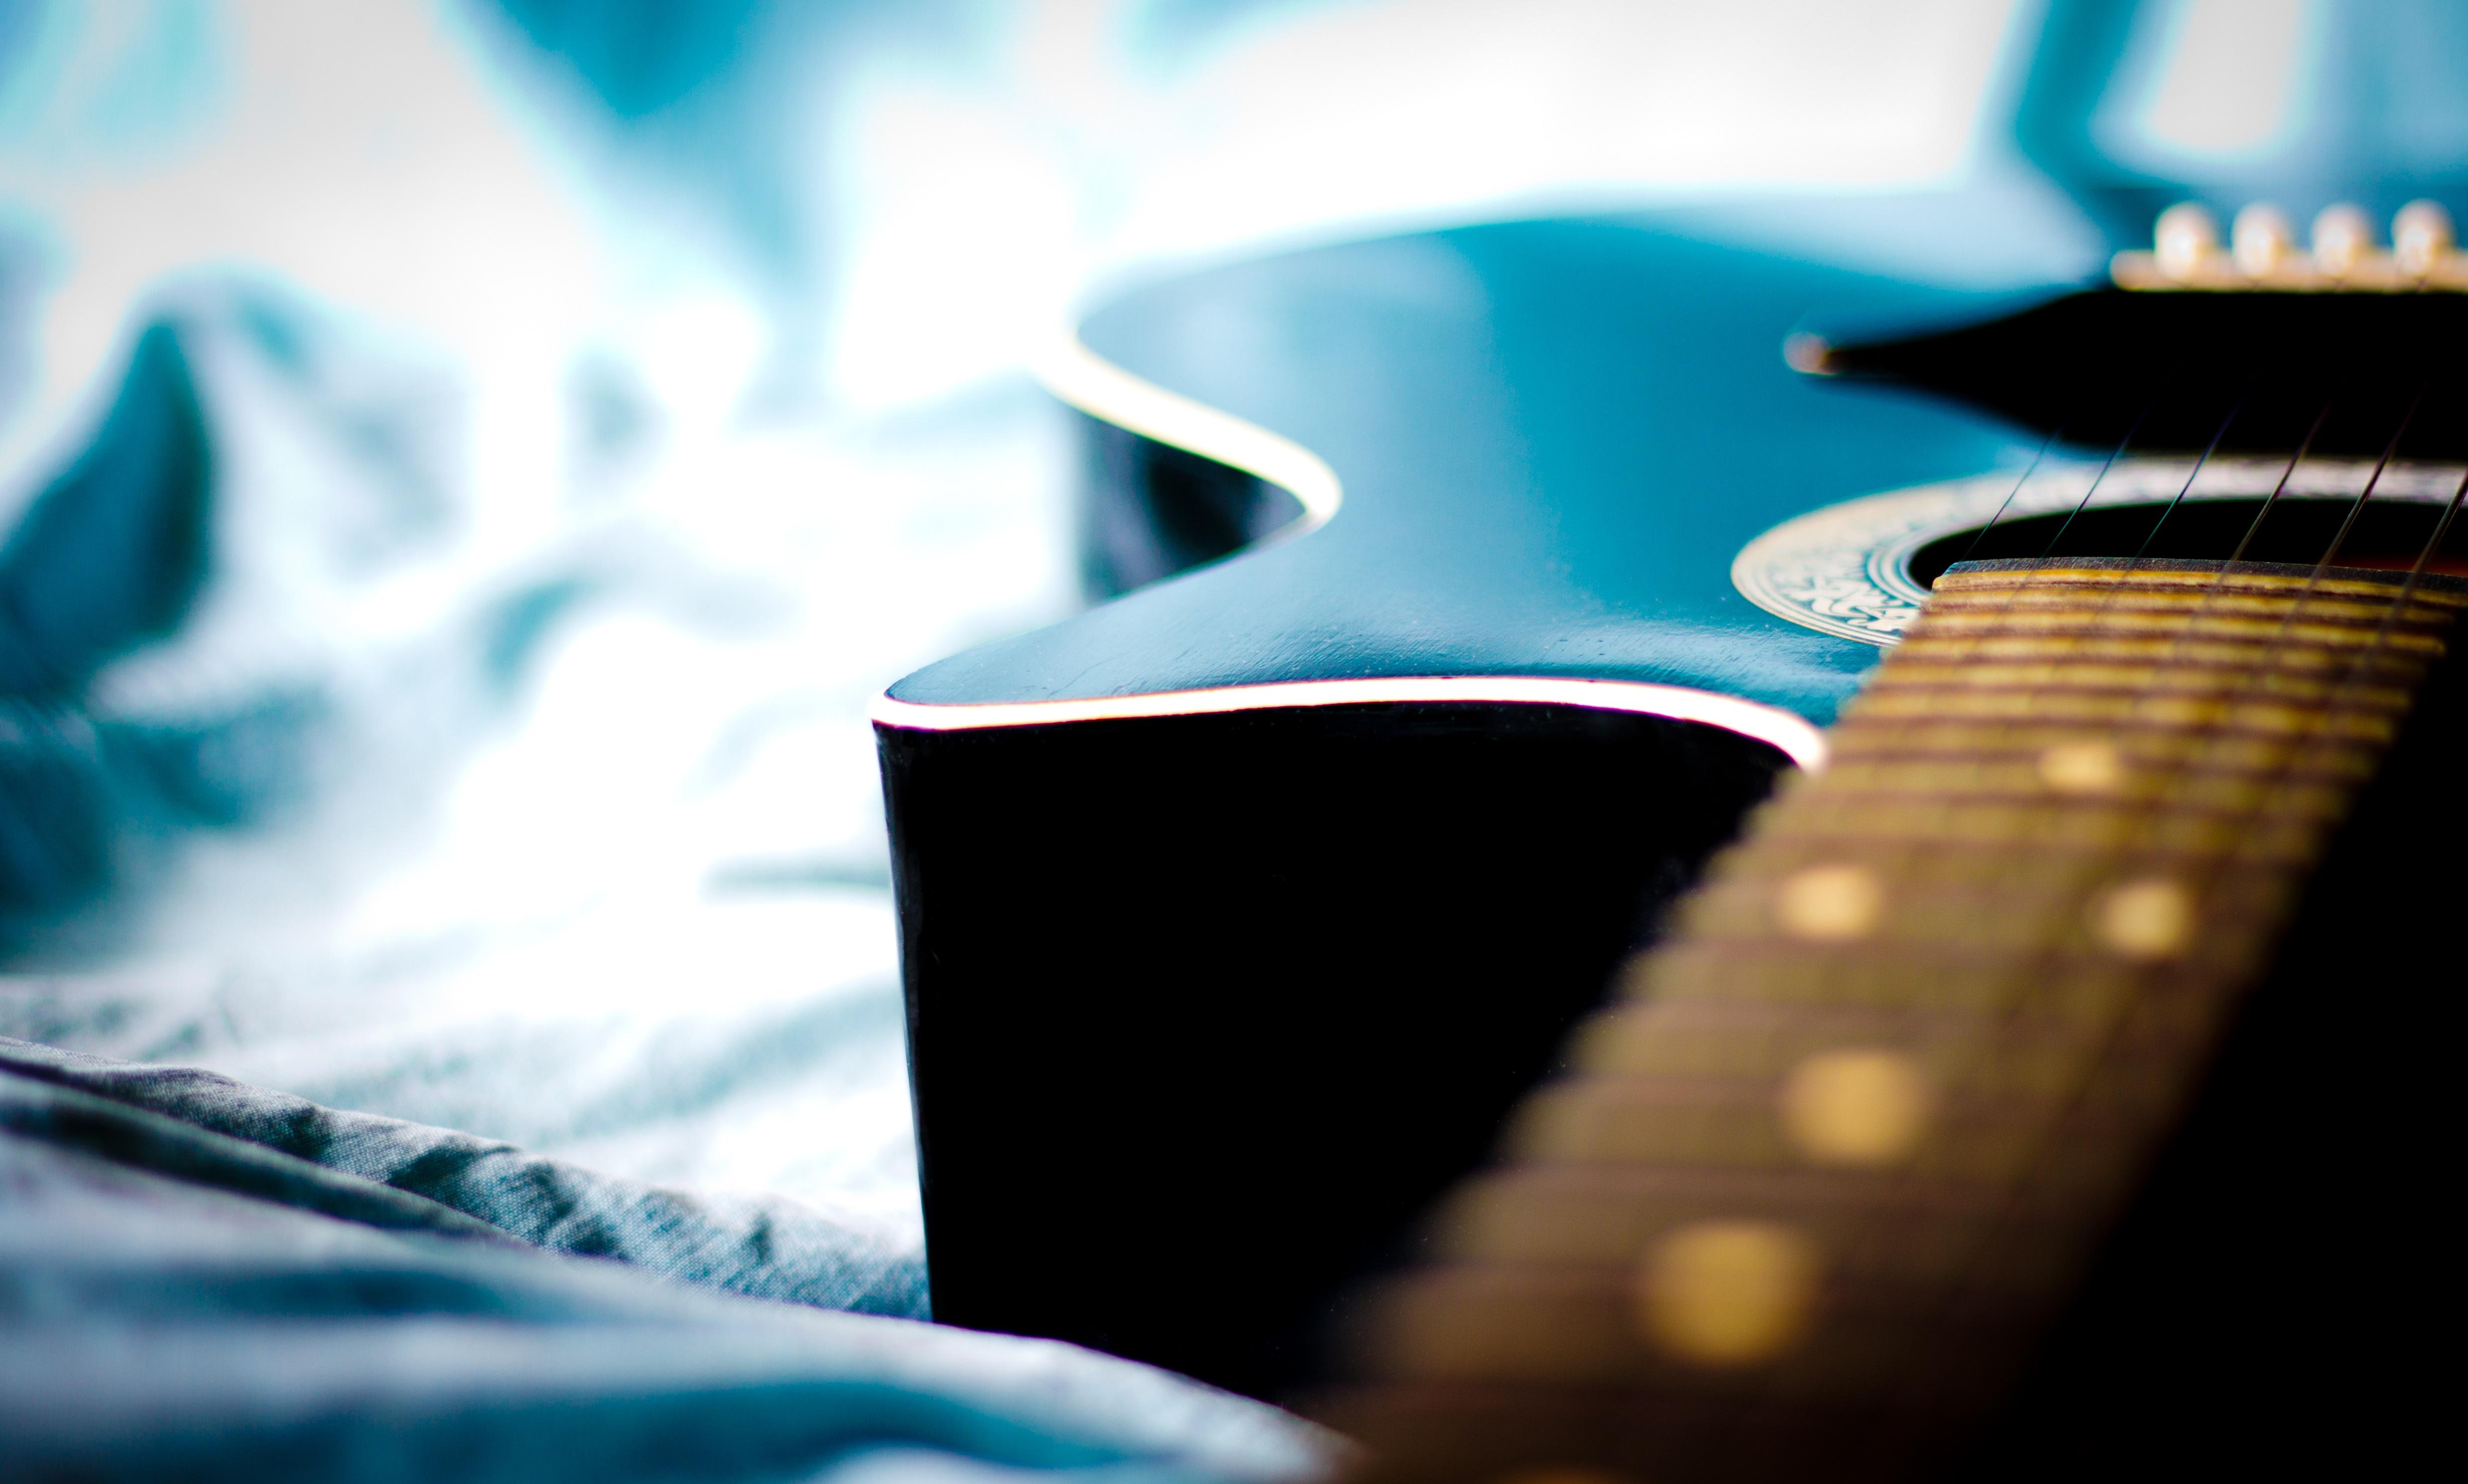 Free Images Music Light Guitar Color Romance Blue Musical